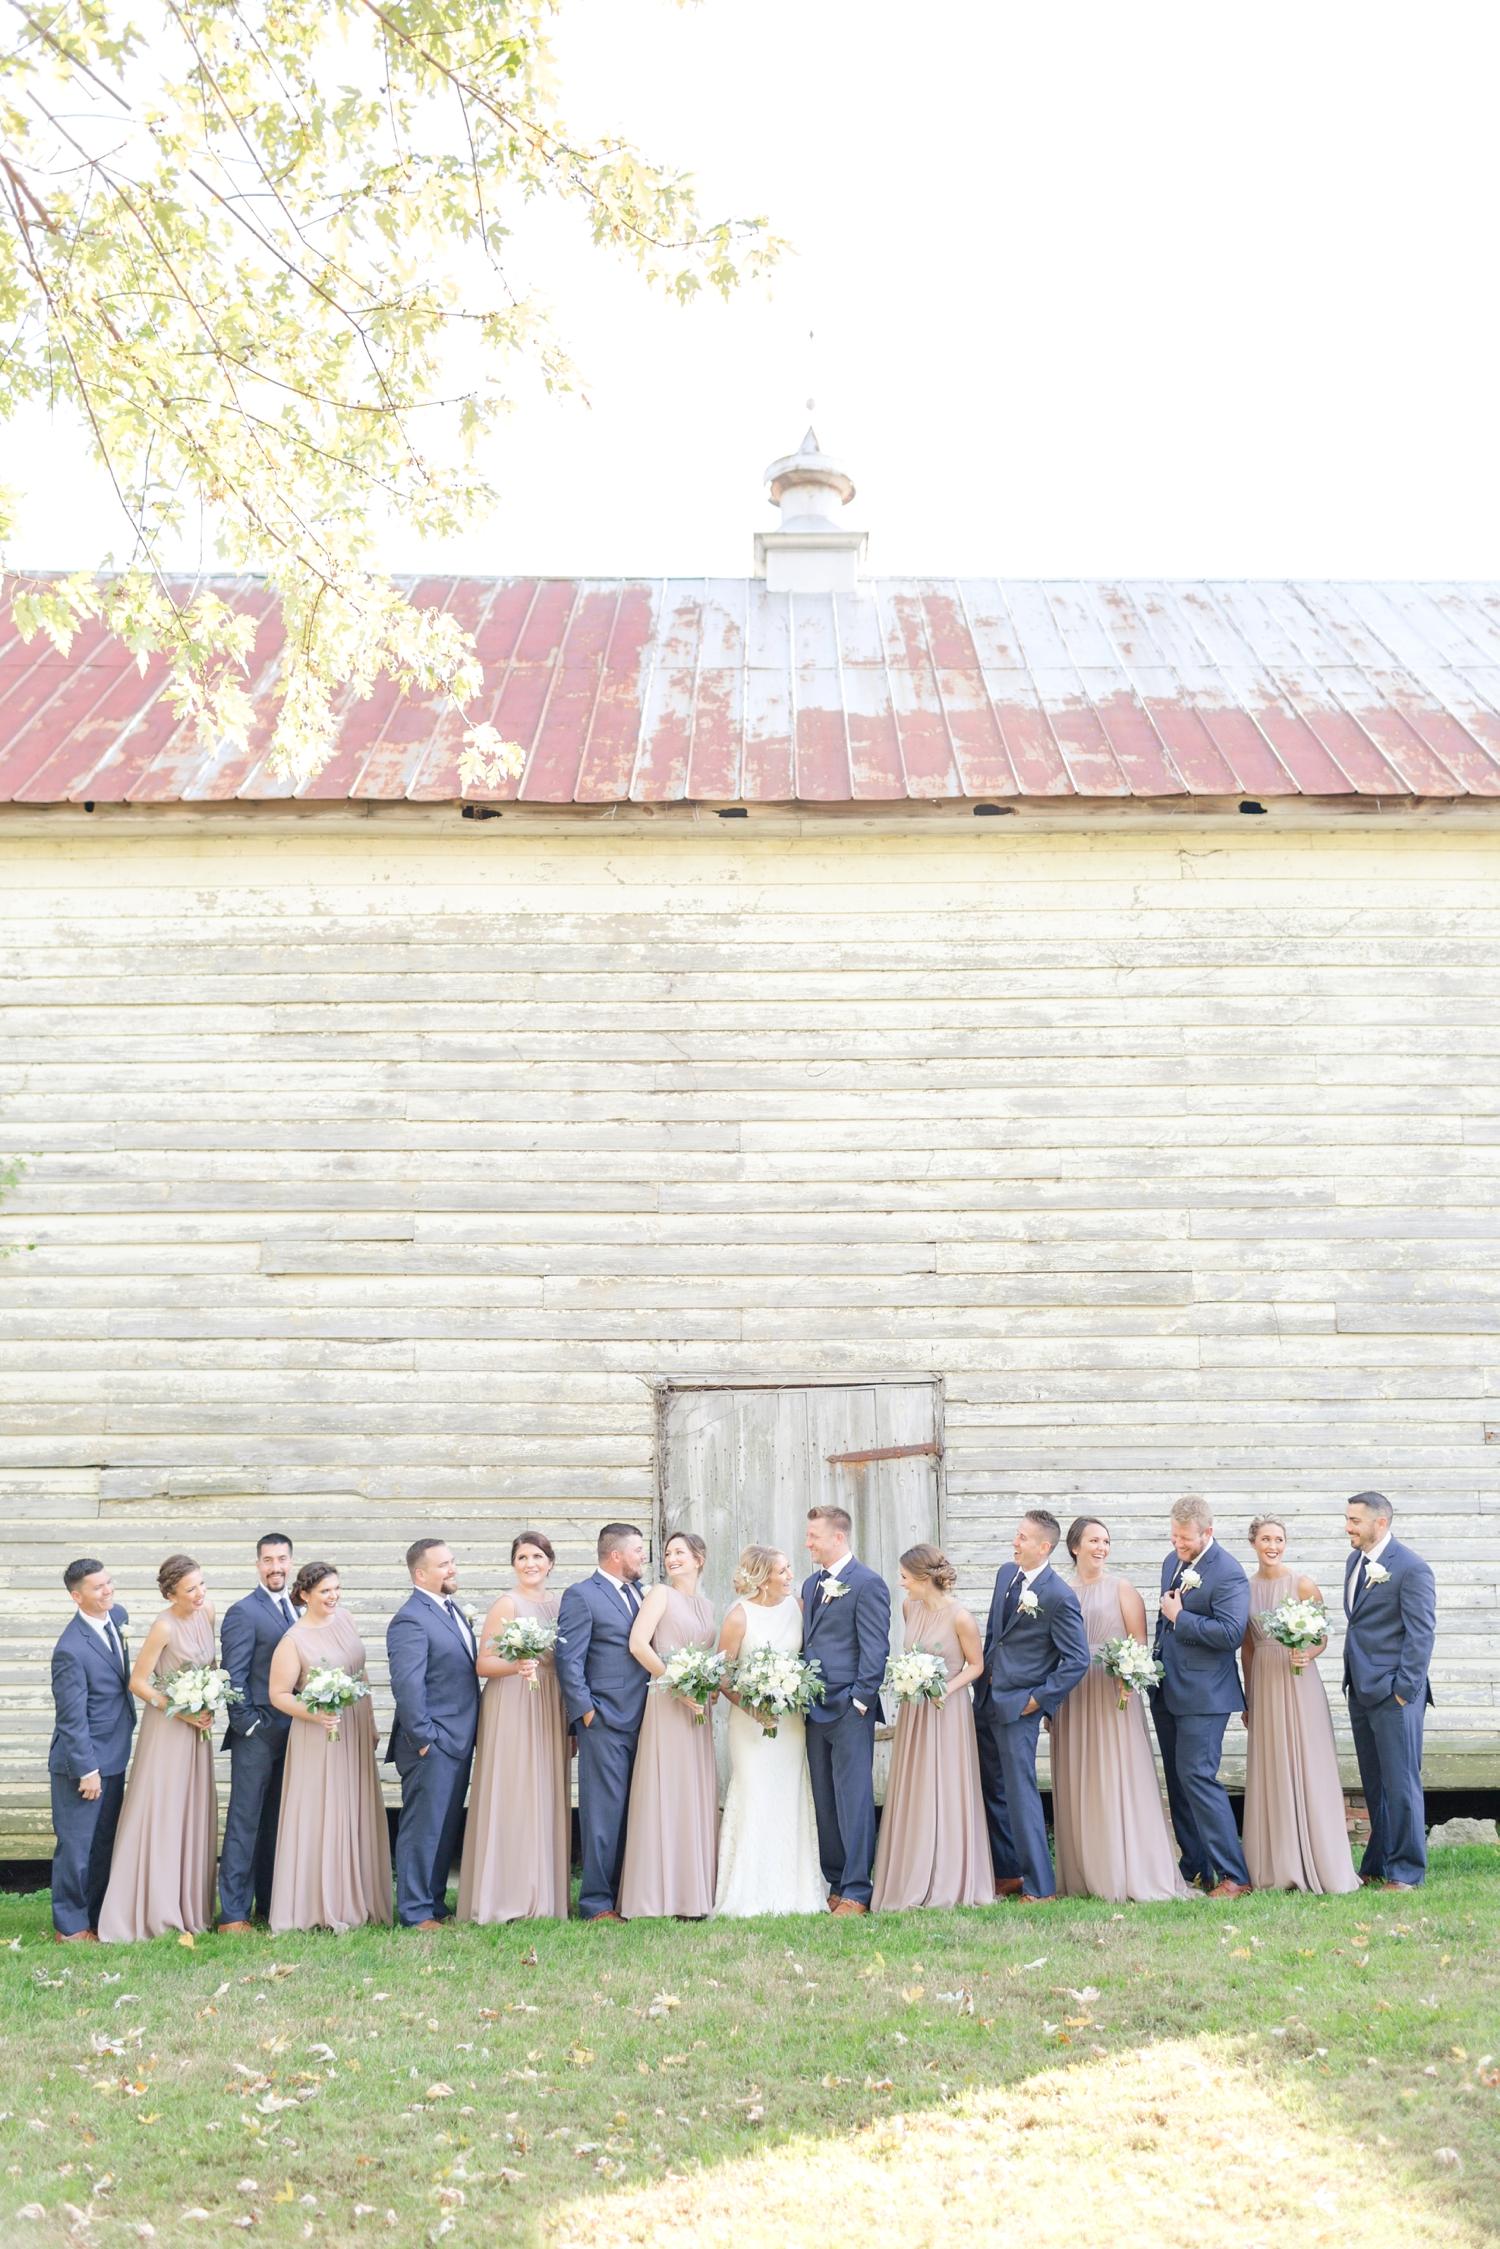 Wojciechowski Wedding-277_the-oaks-waterfront-inn-wedding-easton-maryland-wedding-photography-anna-grace-photography-photo.jpg